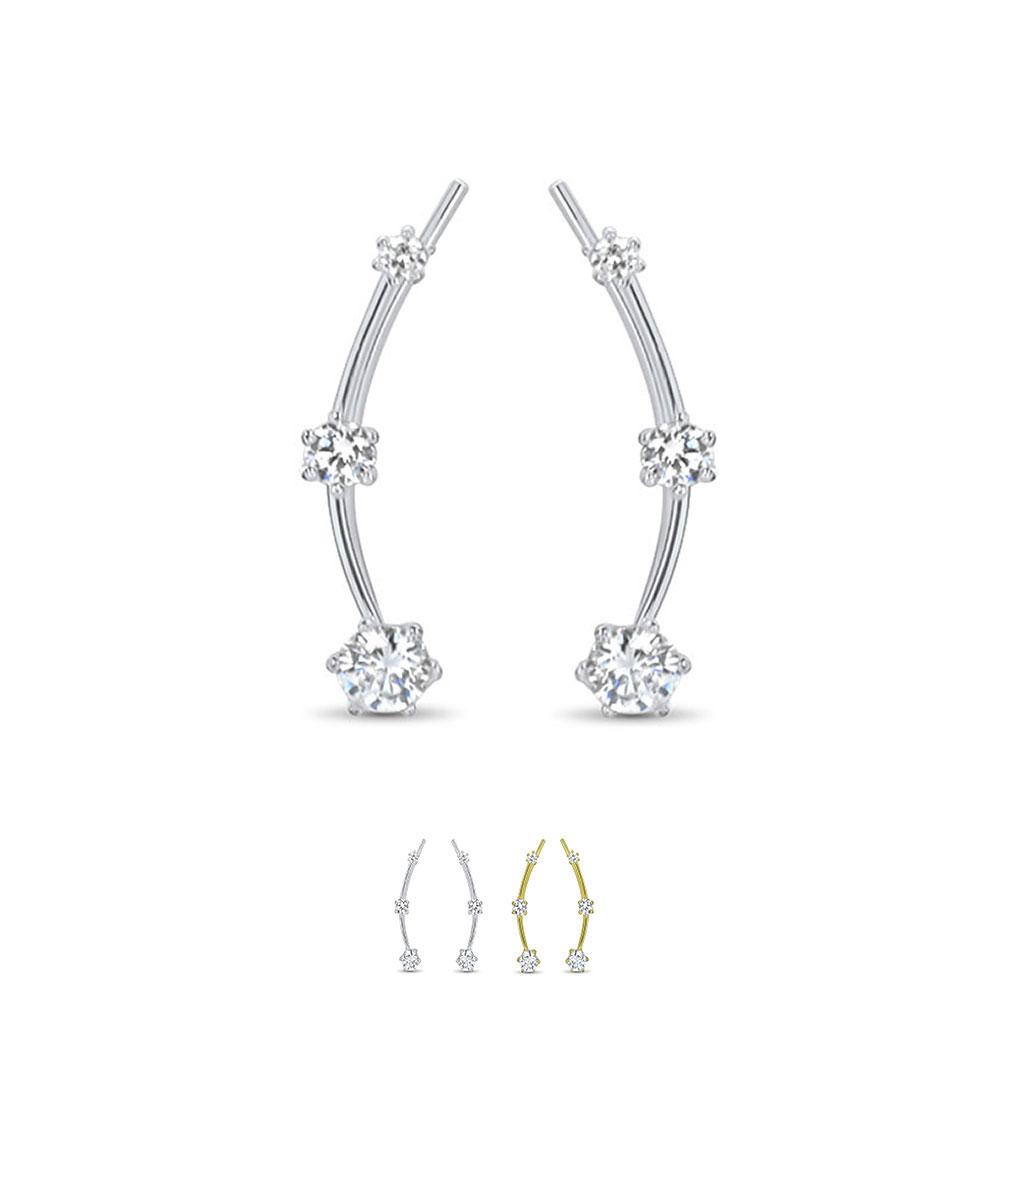 925 Sterling Silver Or 18k Gold Plated Ear Crawler Ear Vine Ear